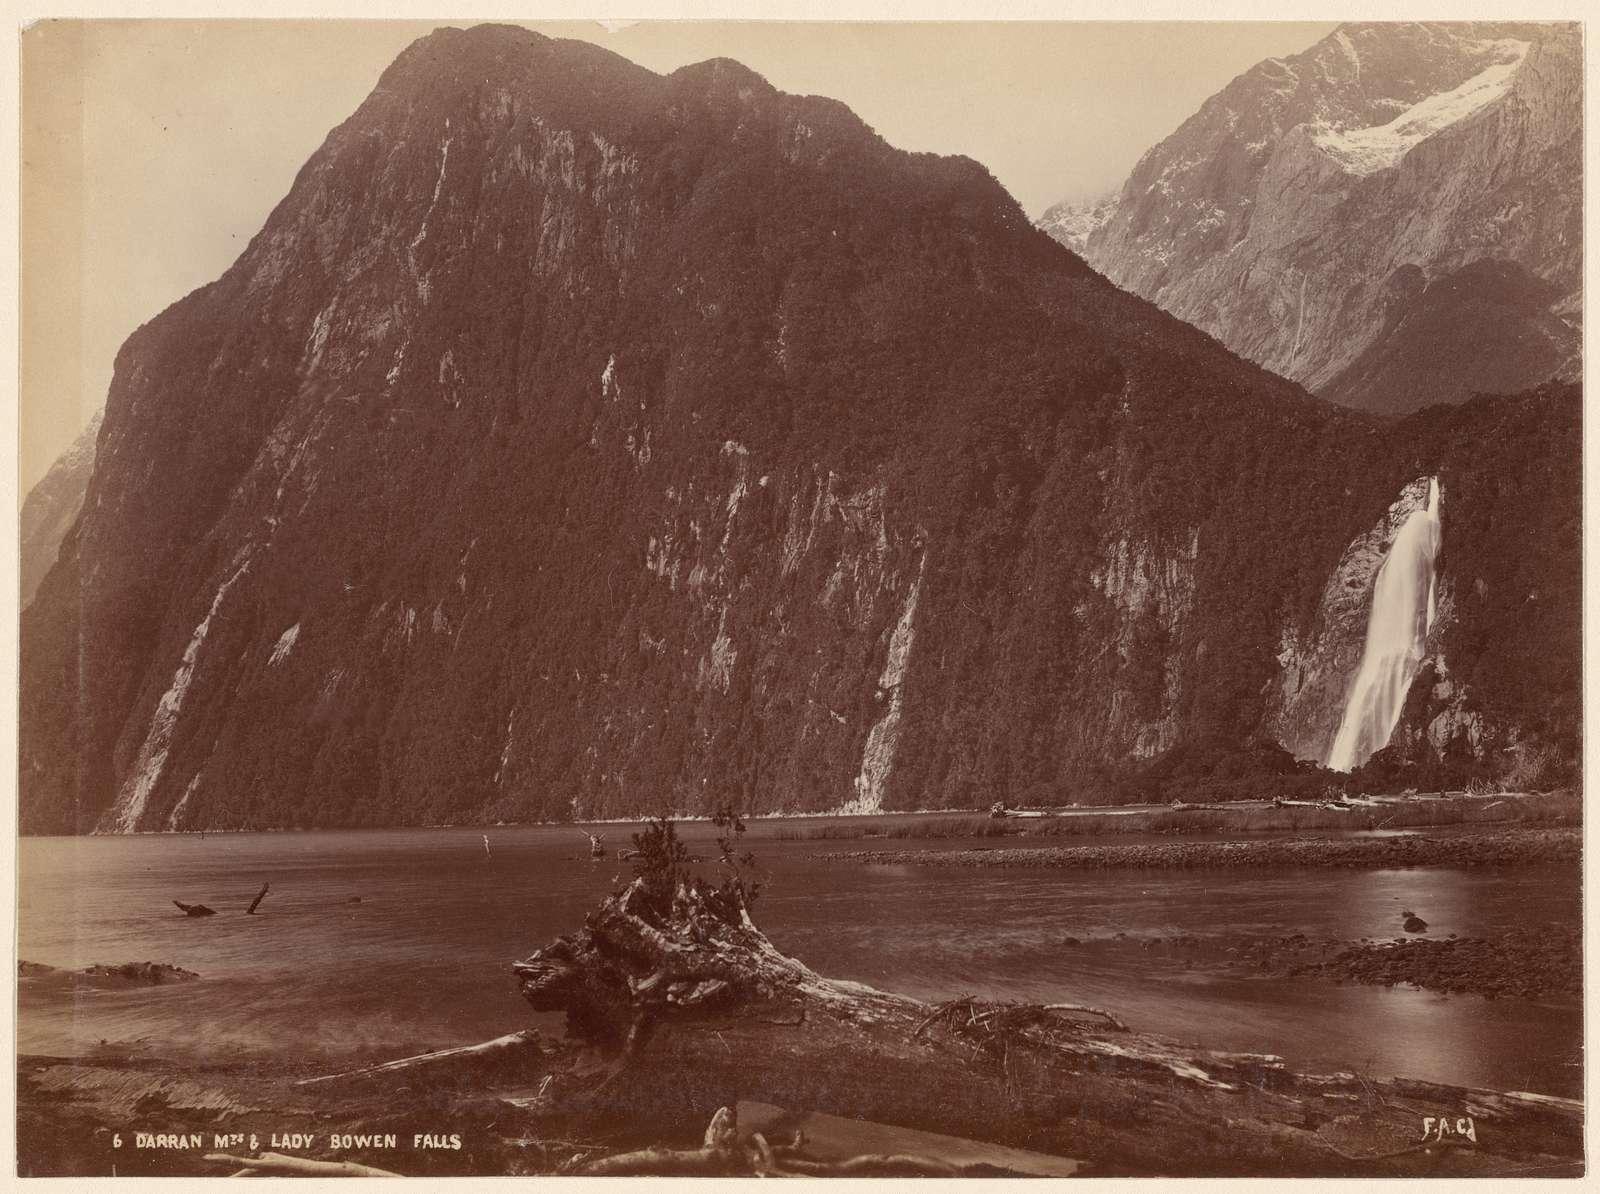 Darran Mts. & Lady Bowen Falls